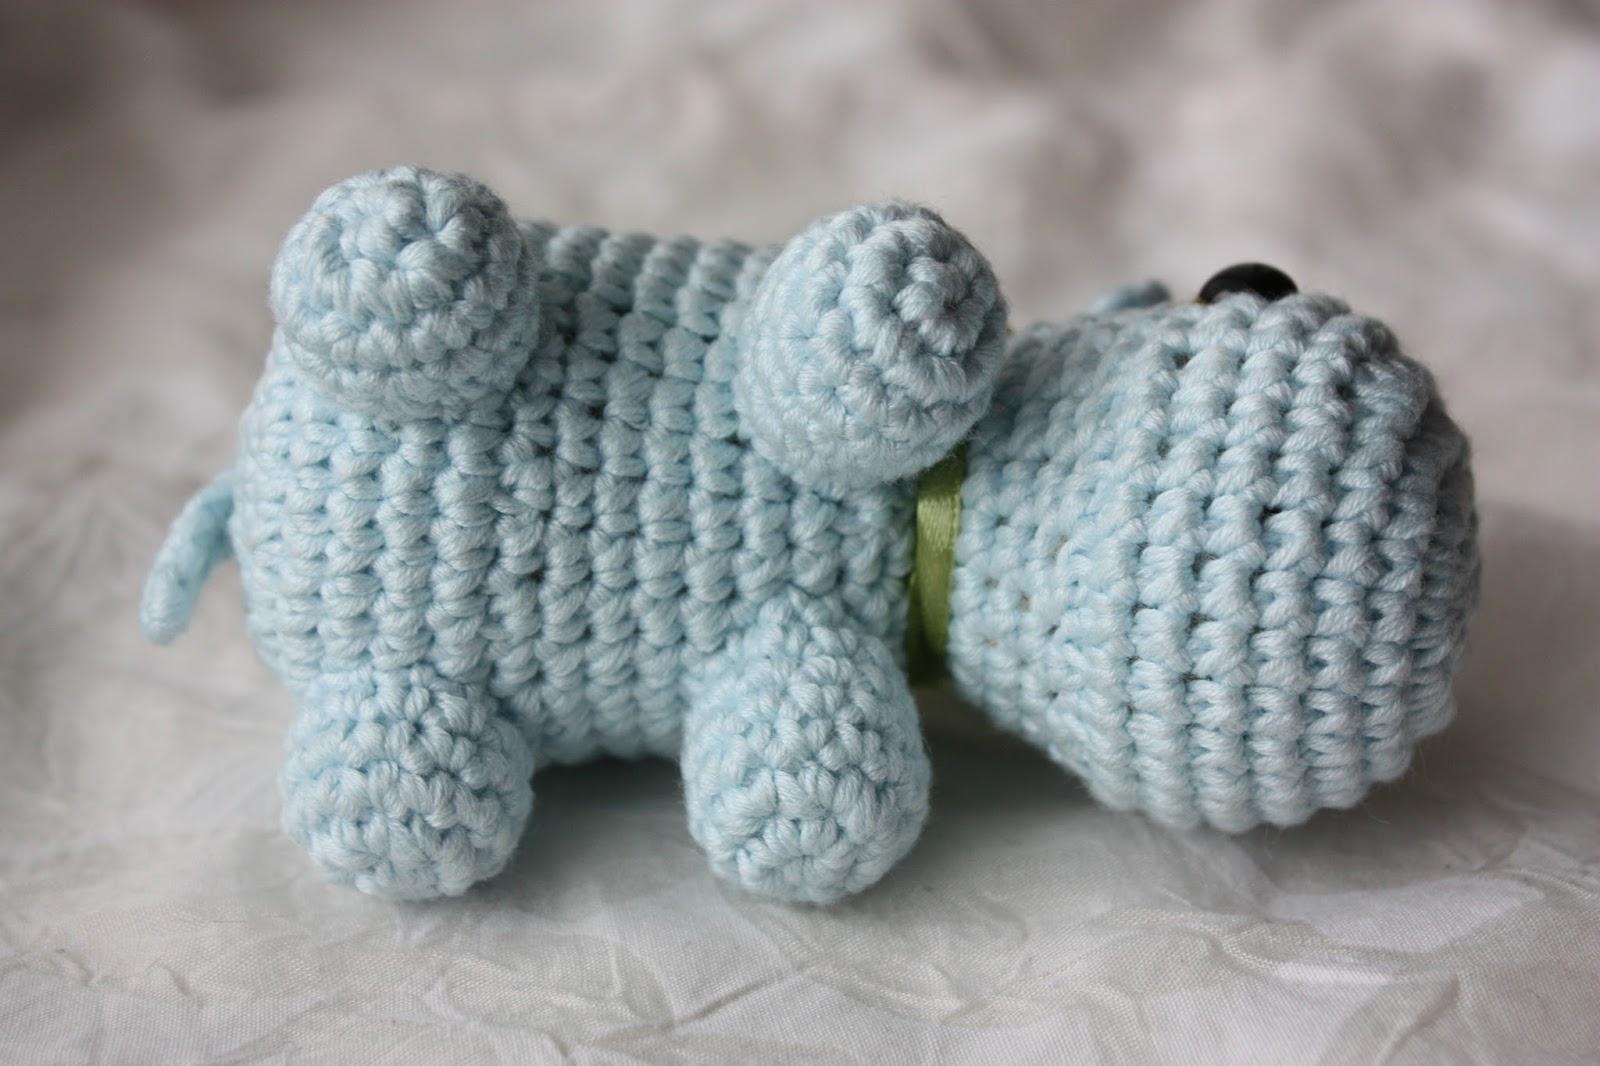 Amigurumi Tuto : Happyamigurumi amigurumi hippo pattern pdf amigurumi toy tutorial